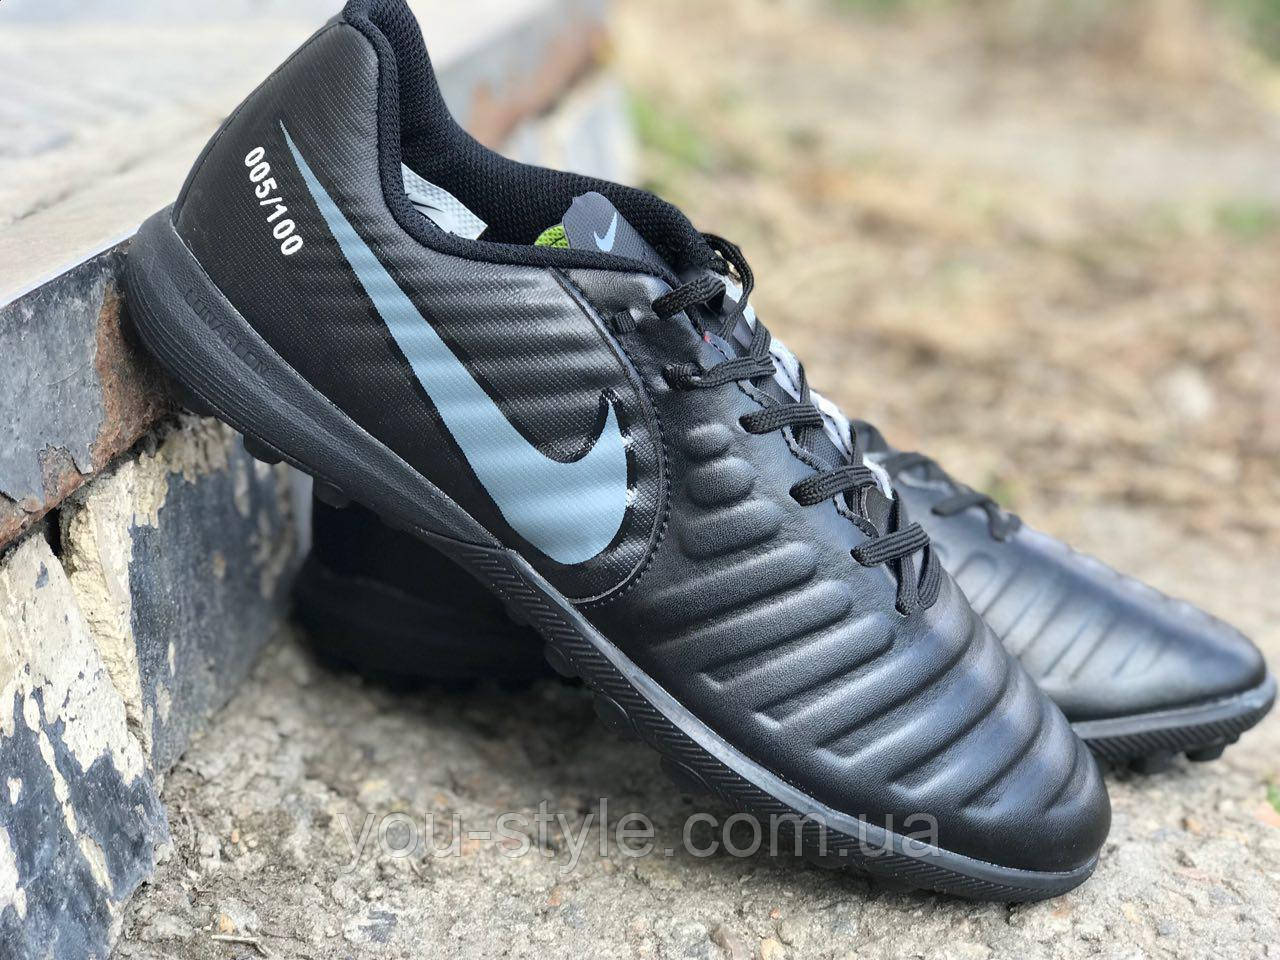 Сороконожки Nike Tiempo Х 1129